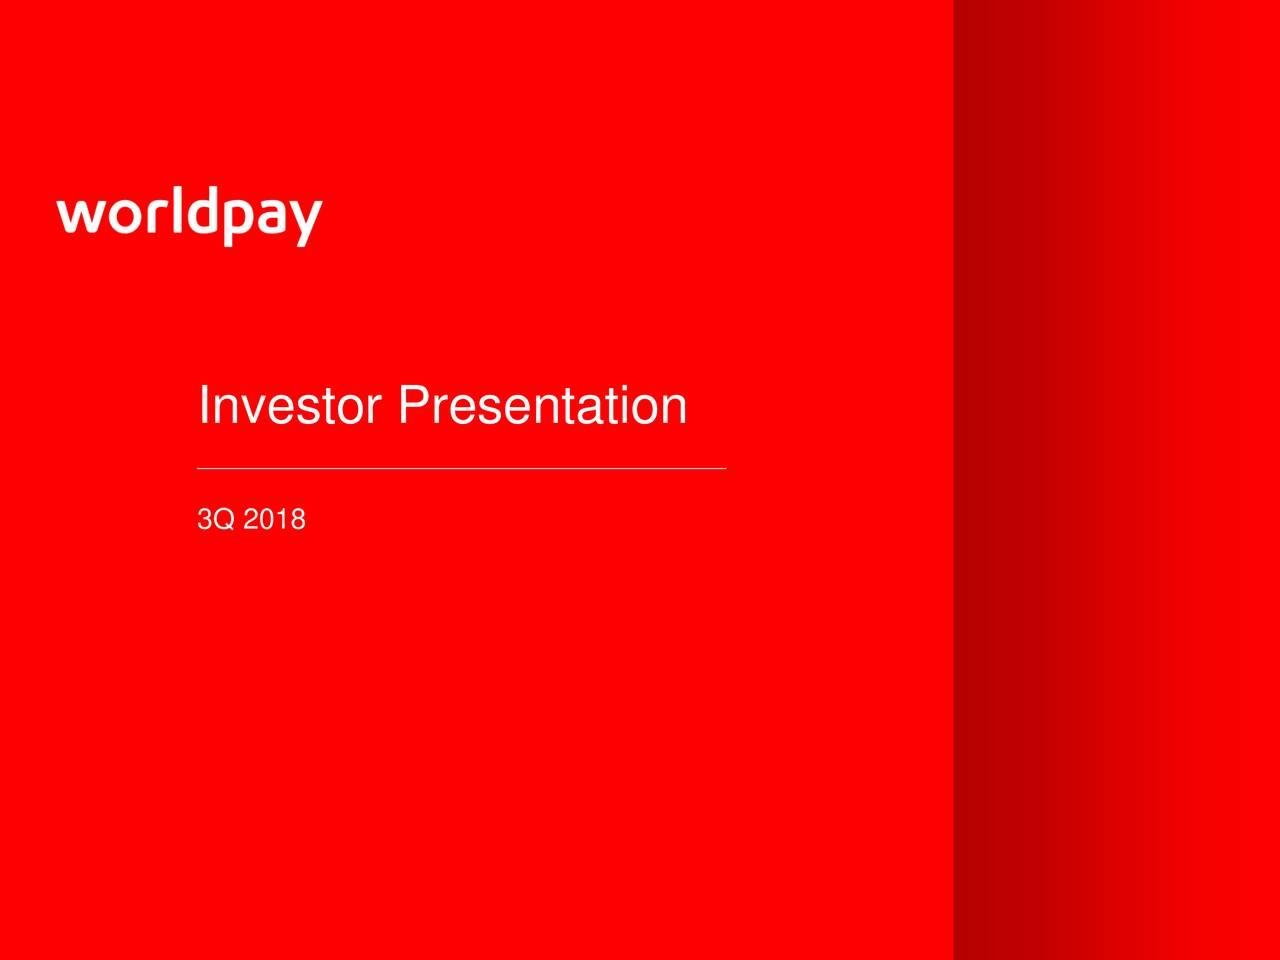 wp stock news and price    worldpay  inc